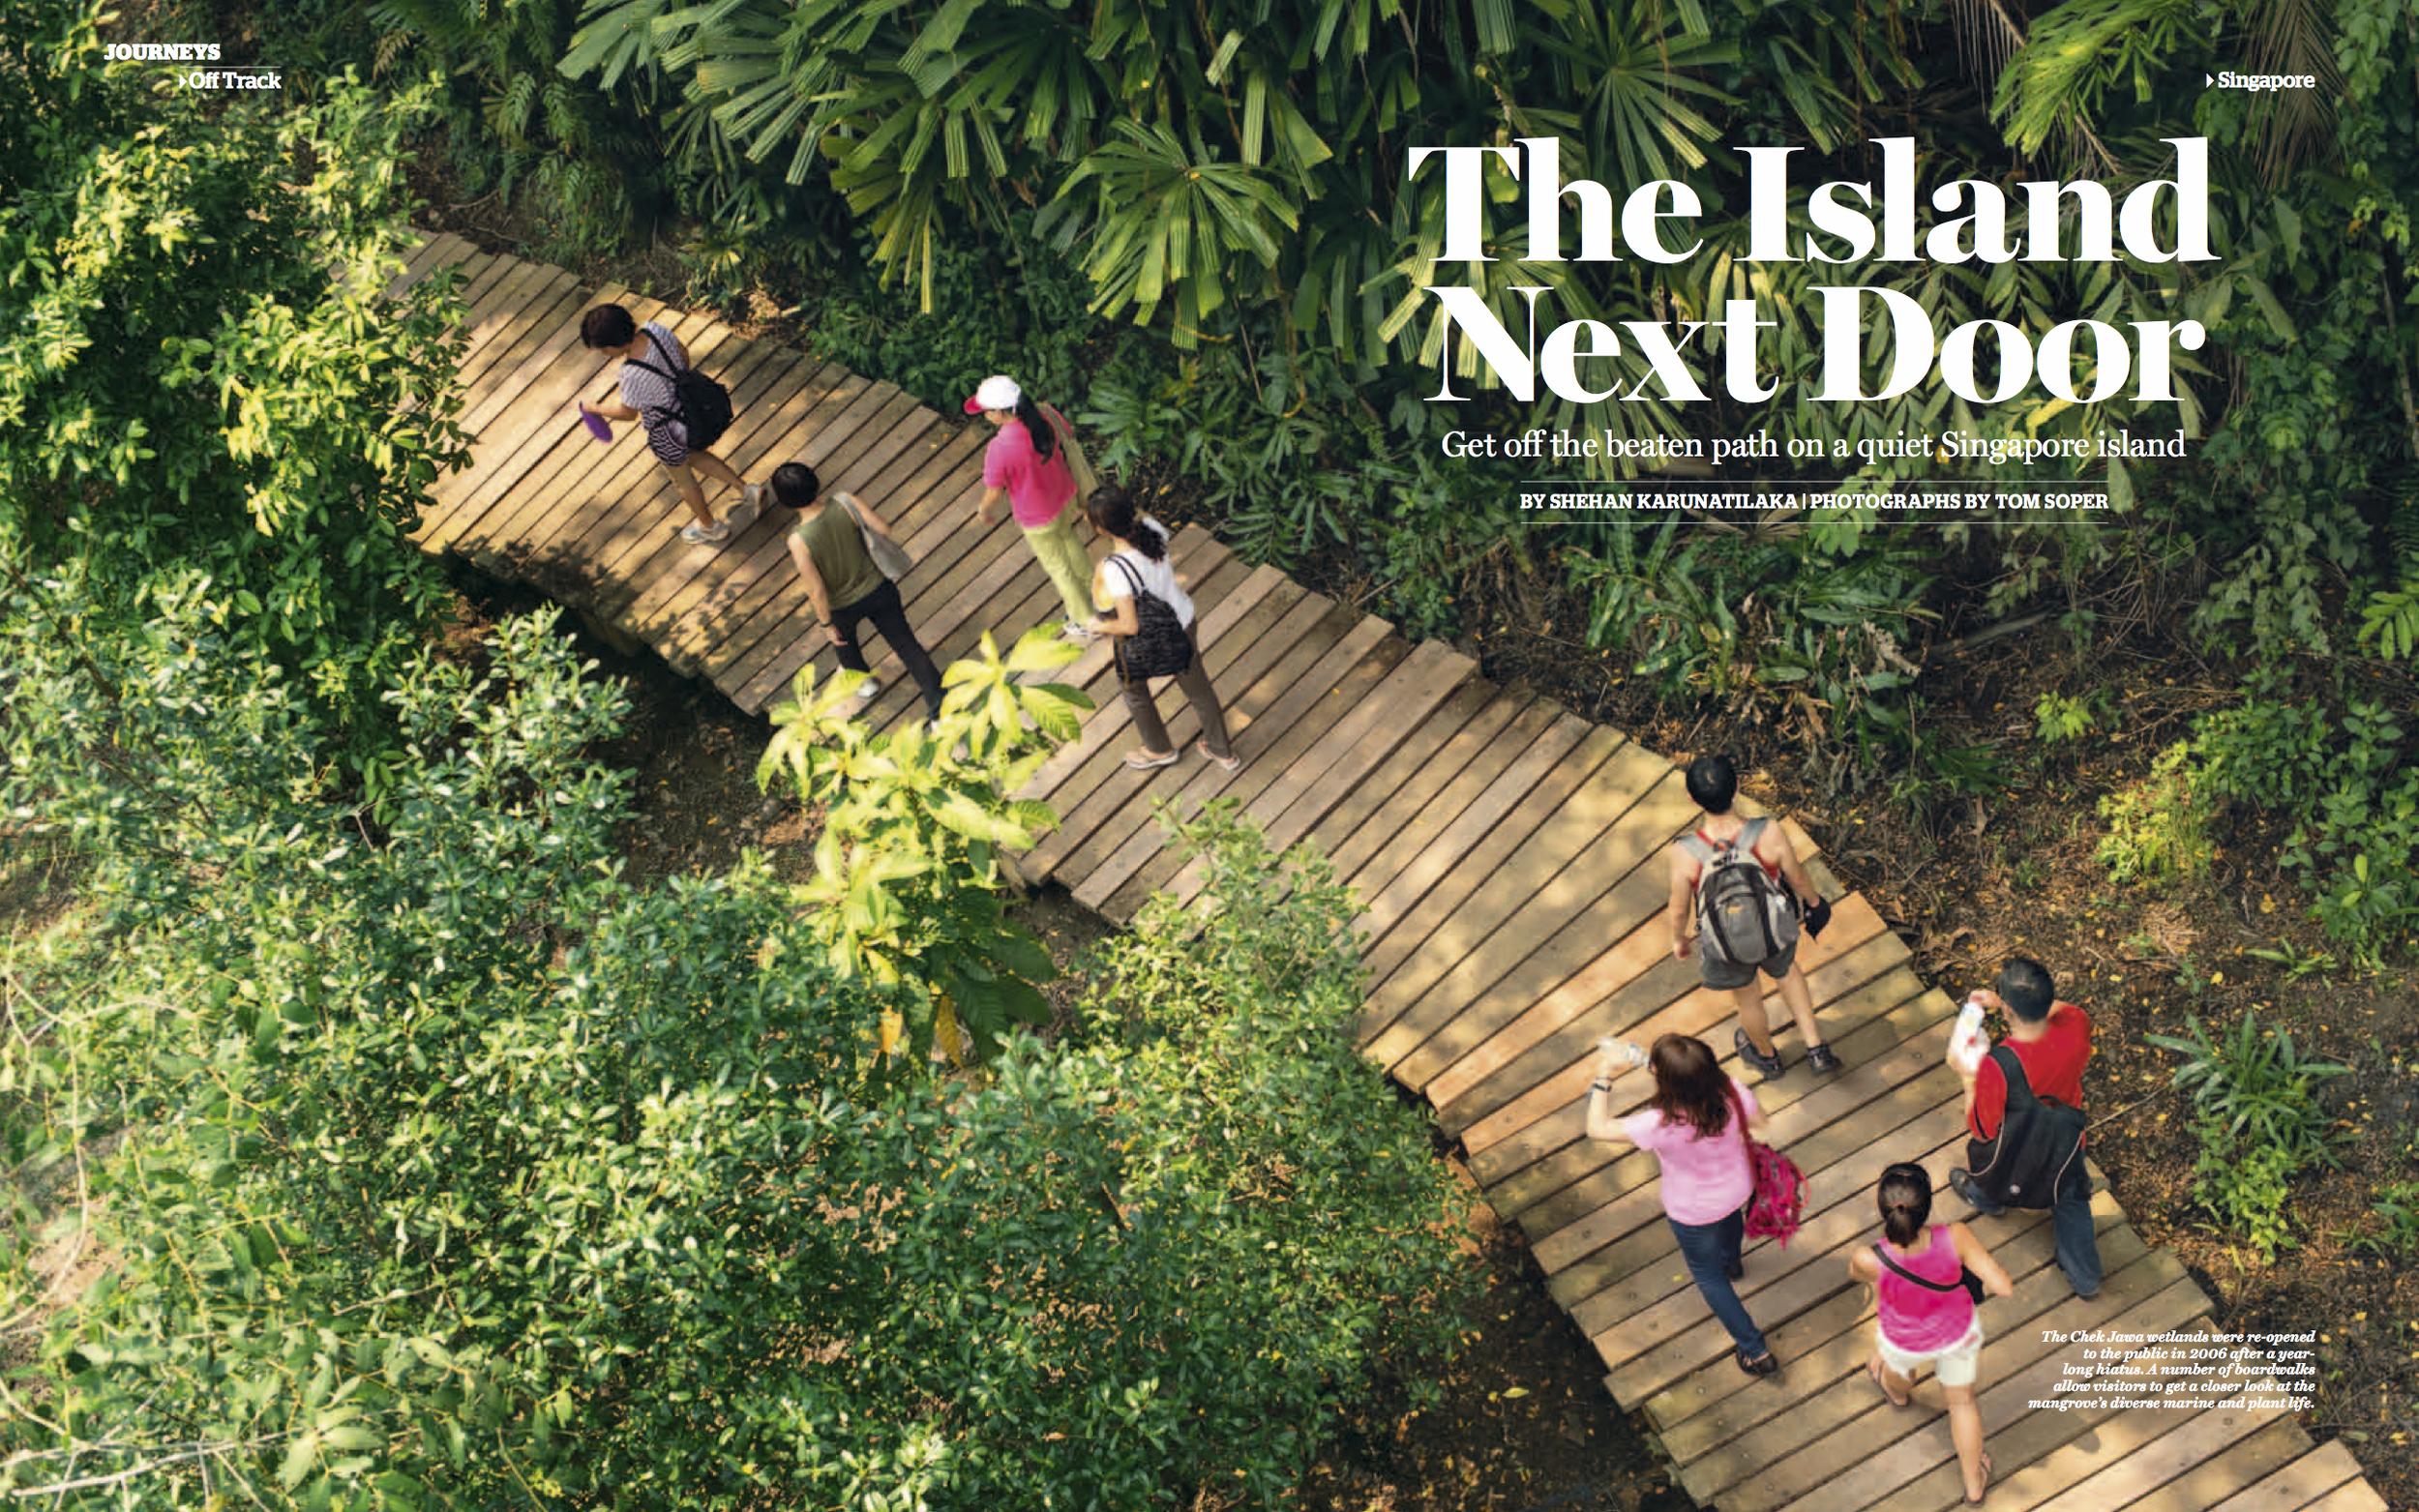 Pulau Ubin.jpg